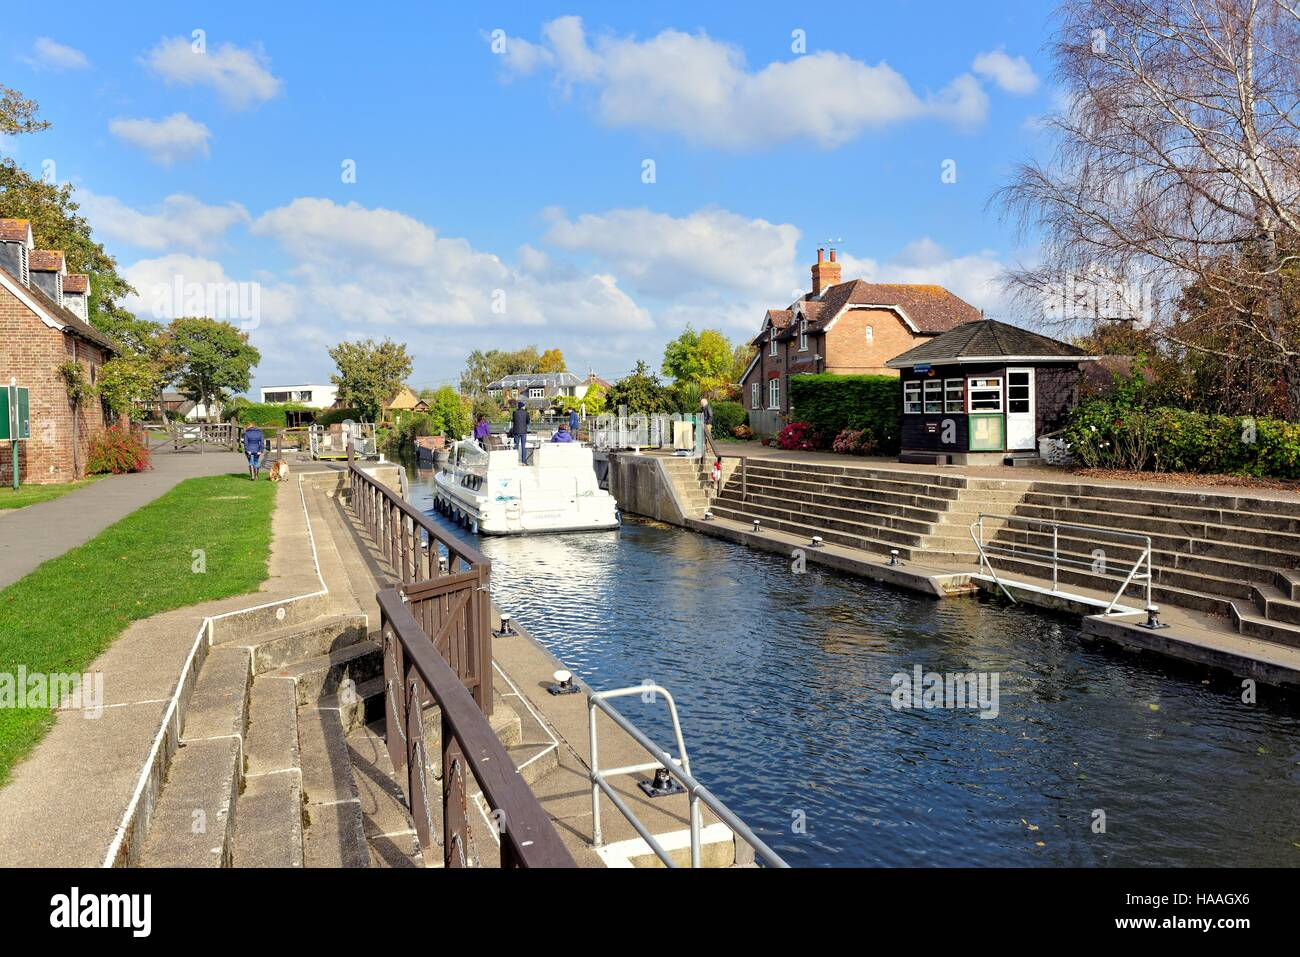 Old Windsor lock on the River Thames UK - Stock Image